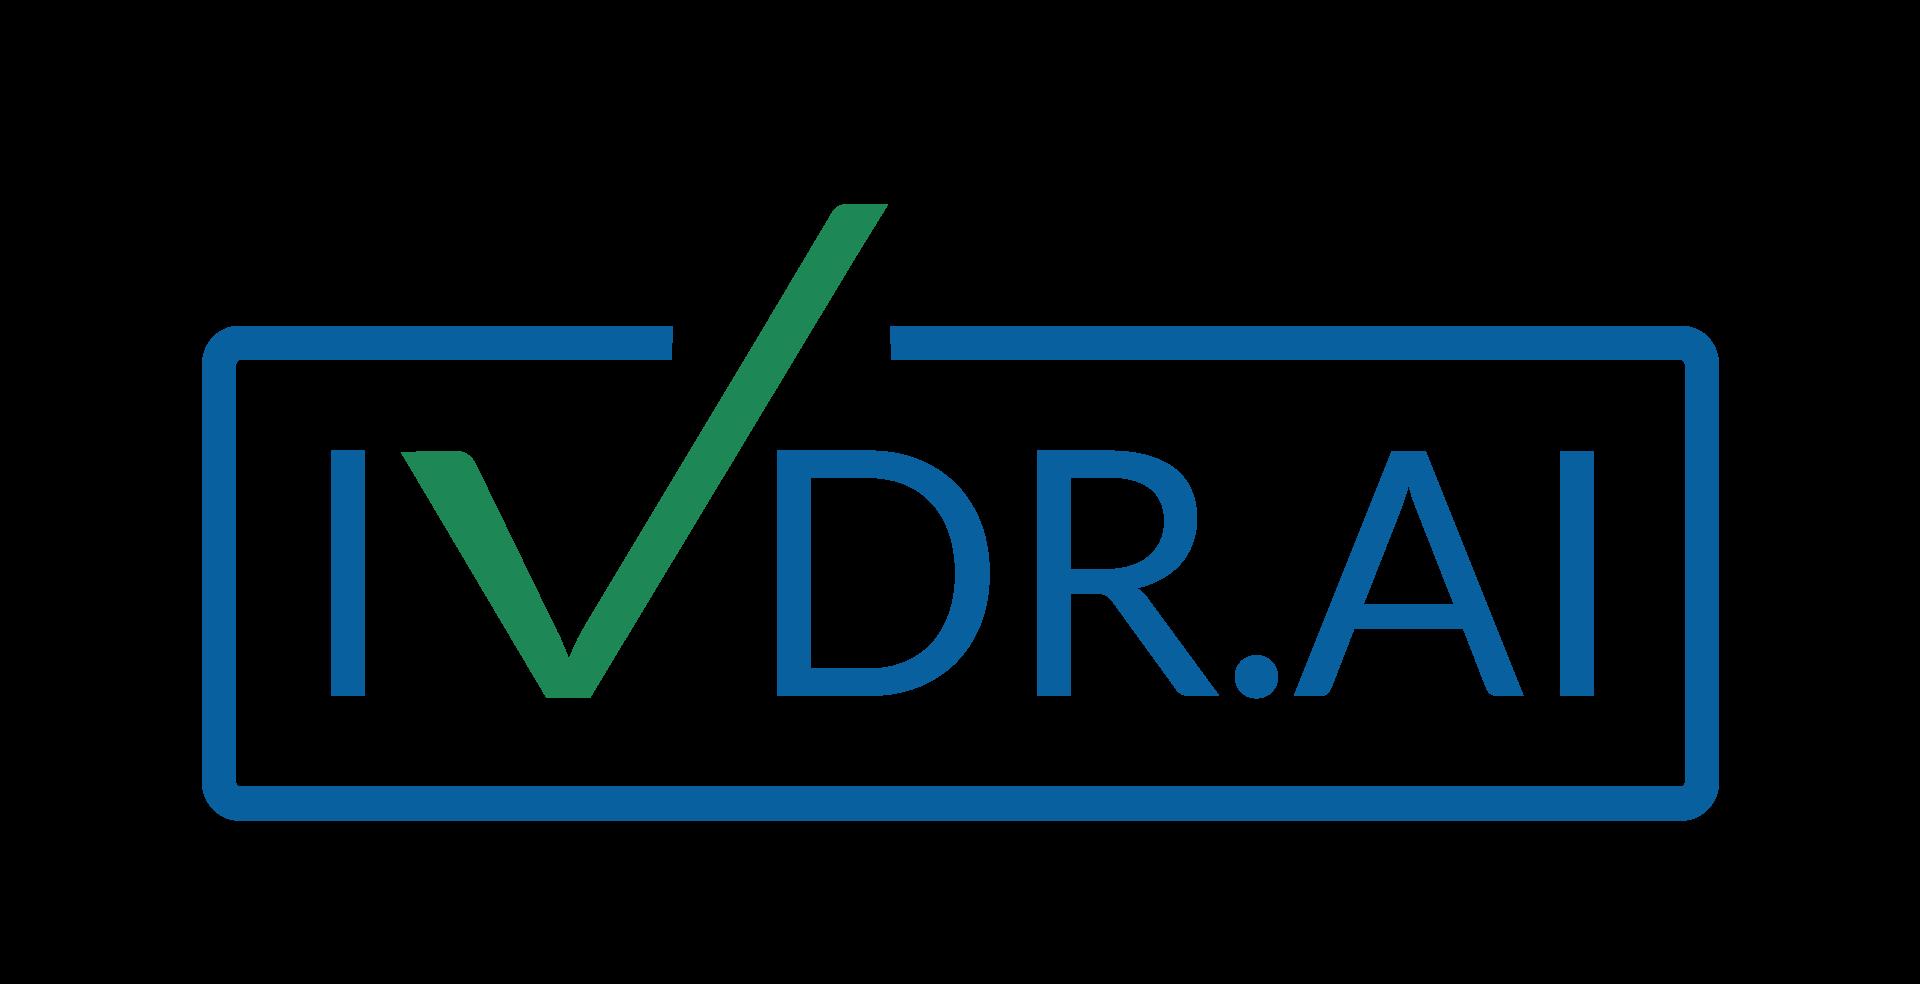 Roche-IVDR-logo-new-1-1